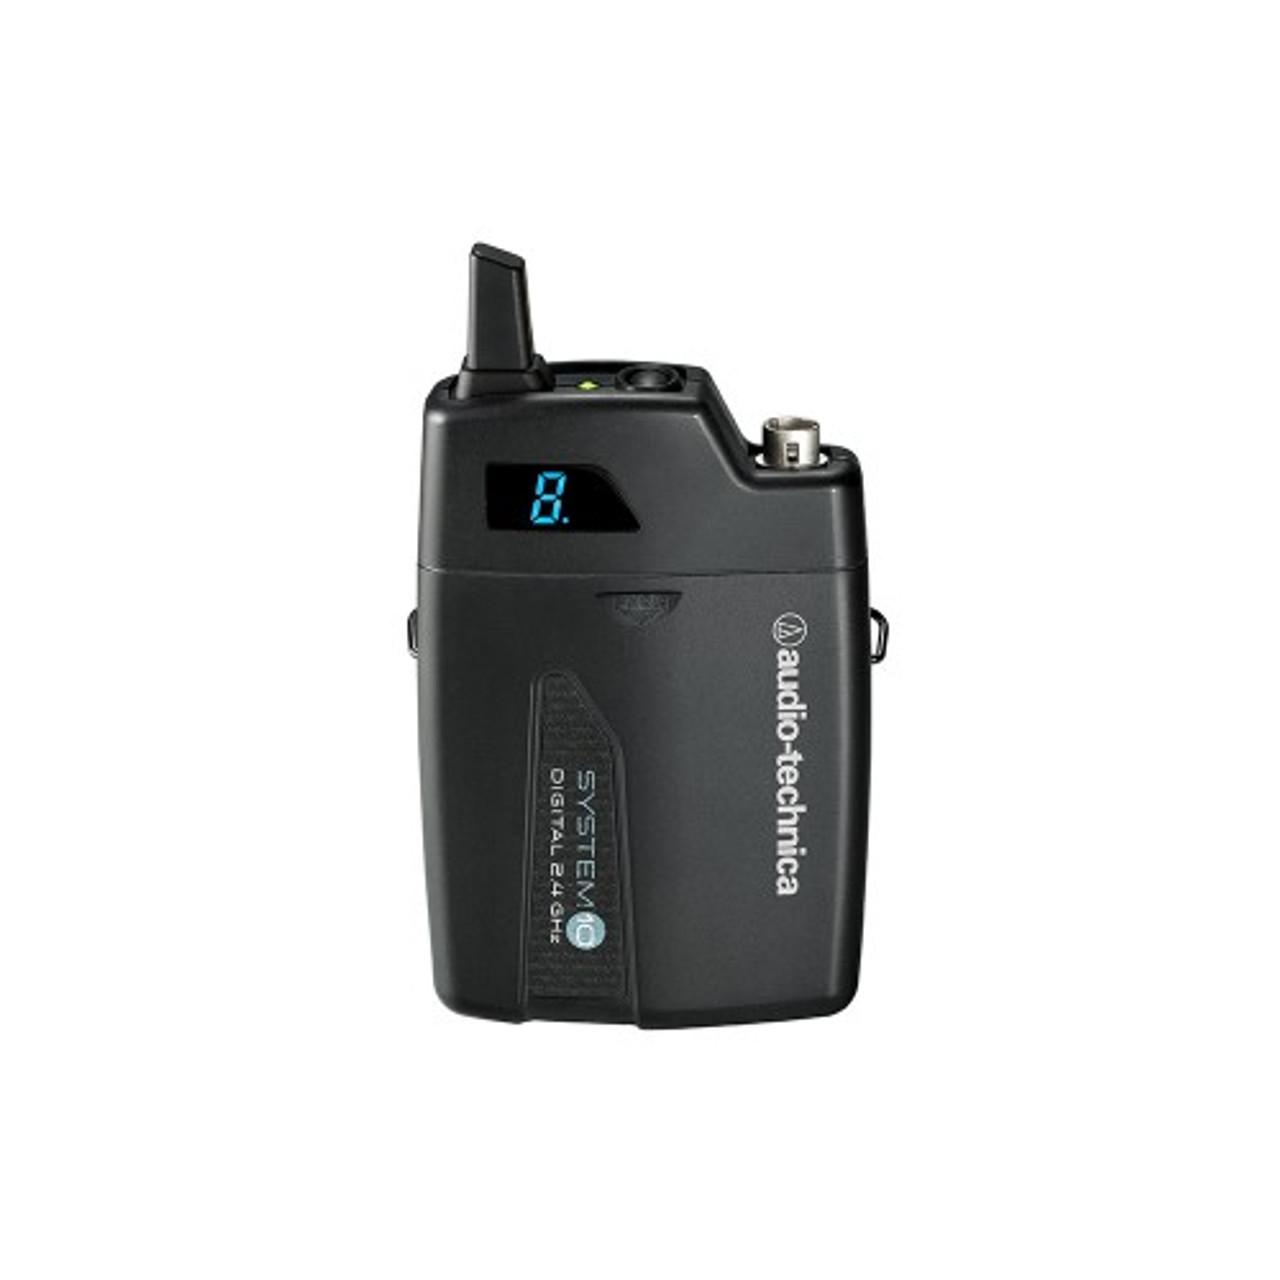 Audio Technica System 10 Digital Wireless